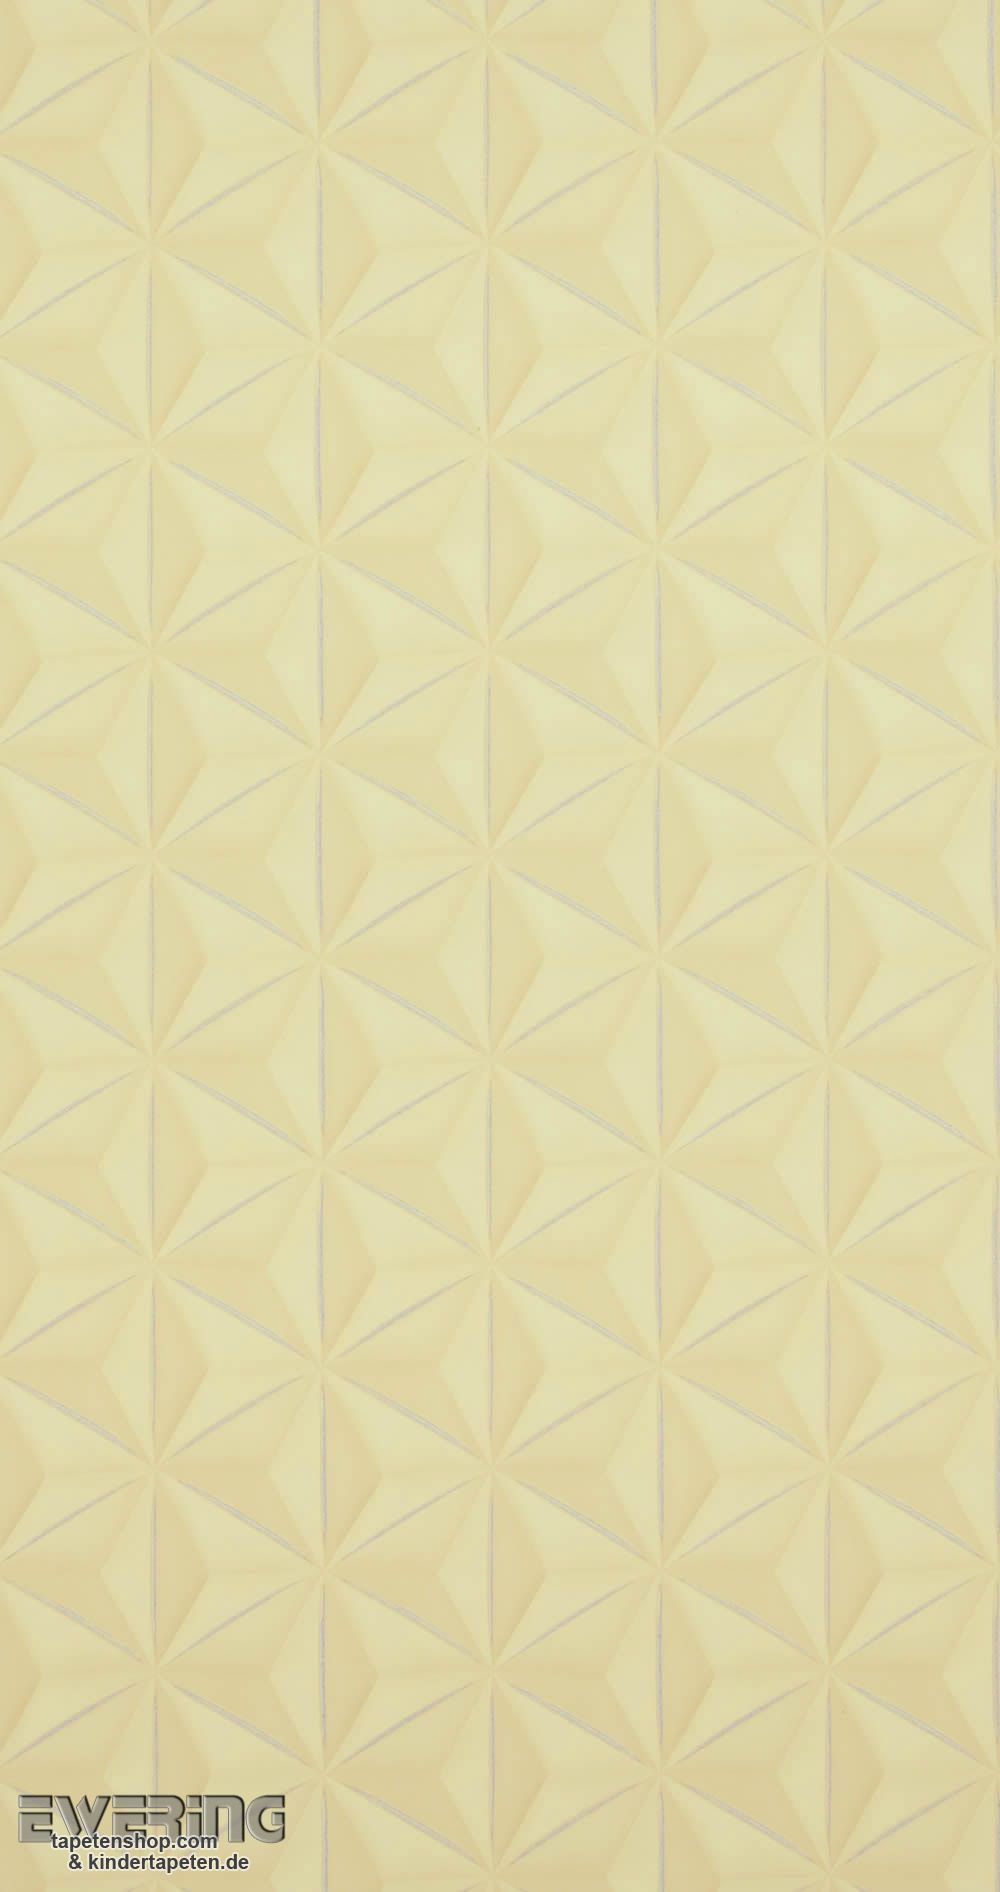 bn tapeten moods 12 17364 hellgelb vliestapete graphisches. Black Bedroom Furniture Sets. Home Design Ideas